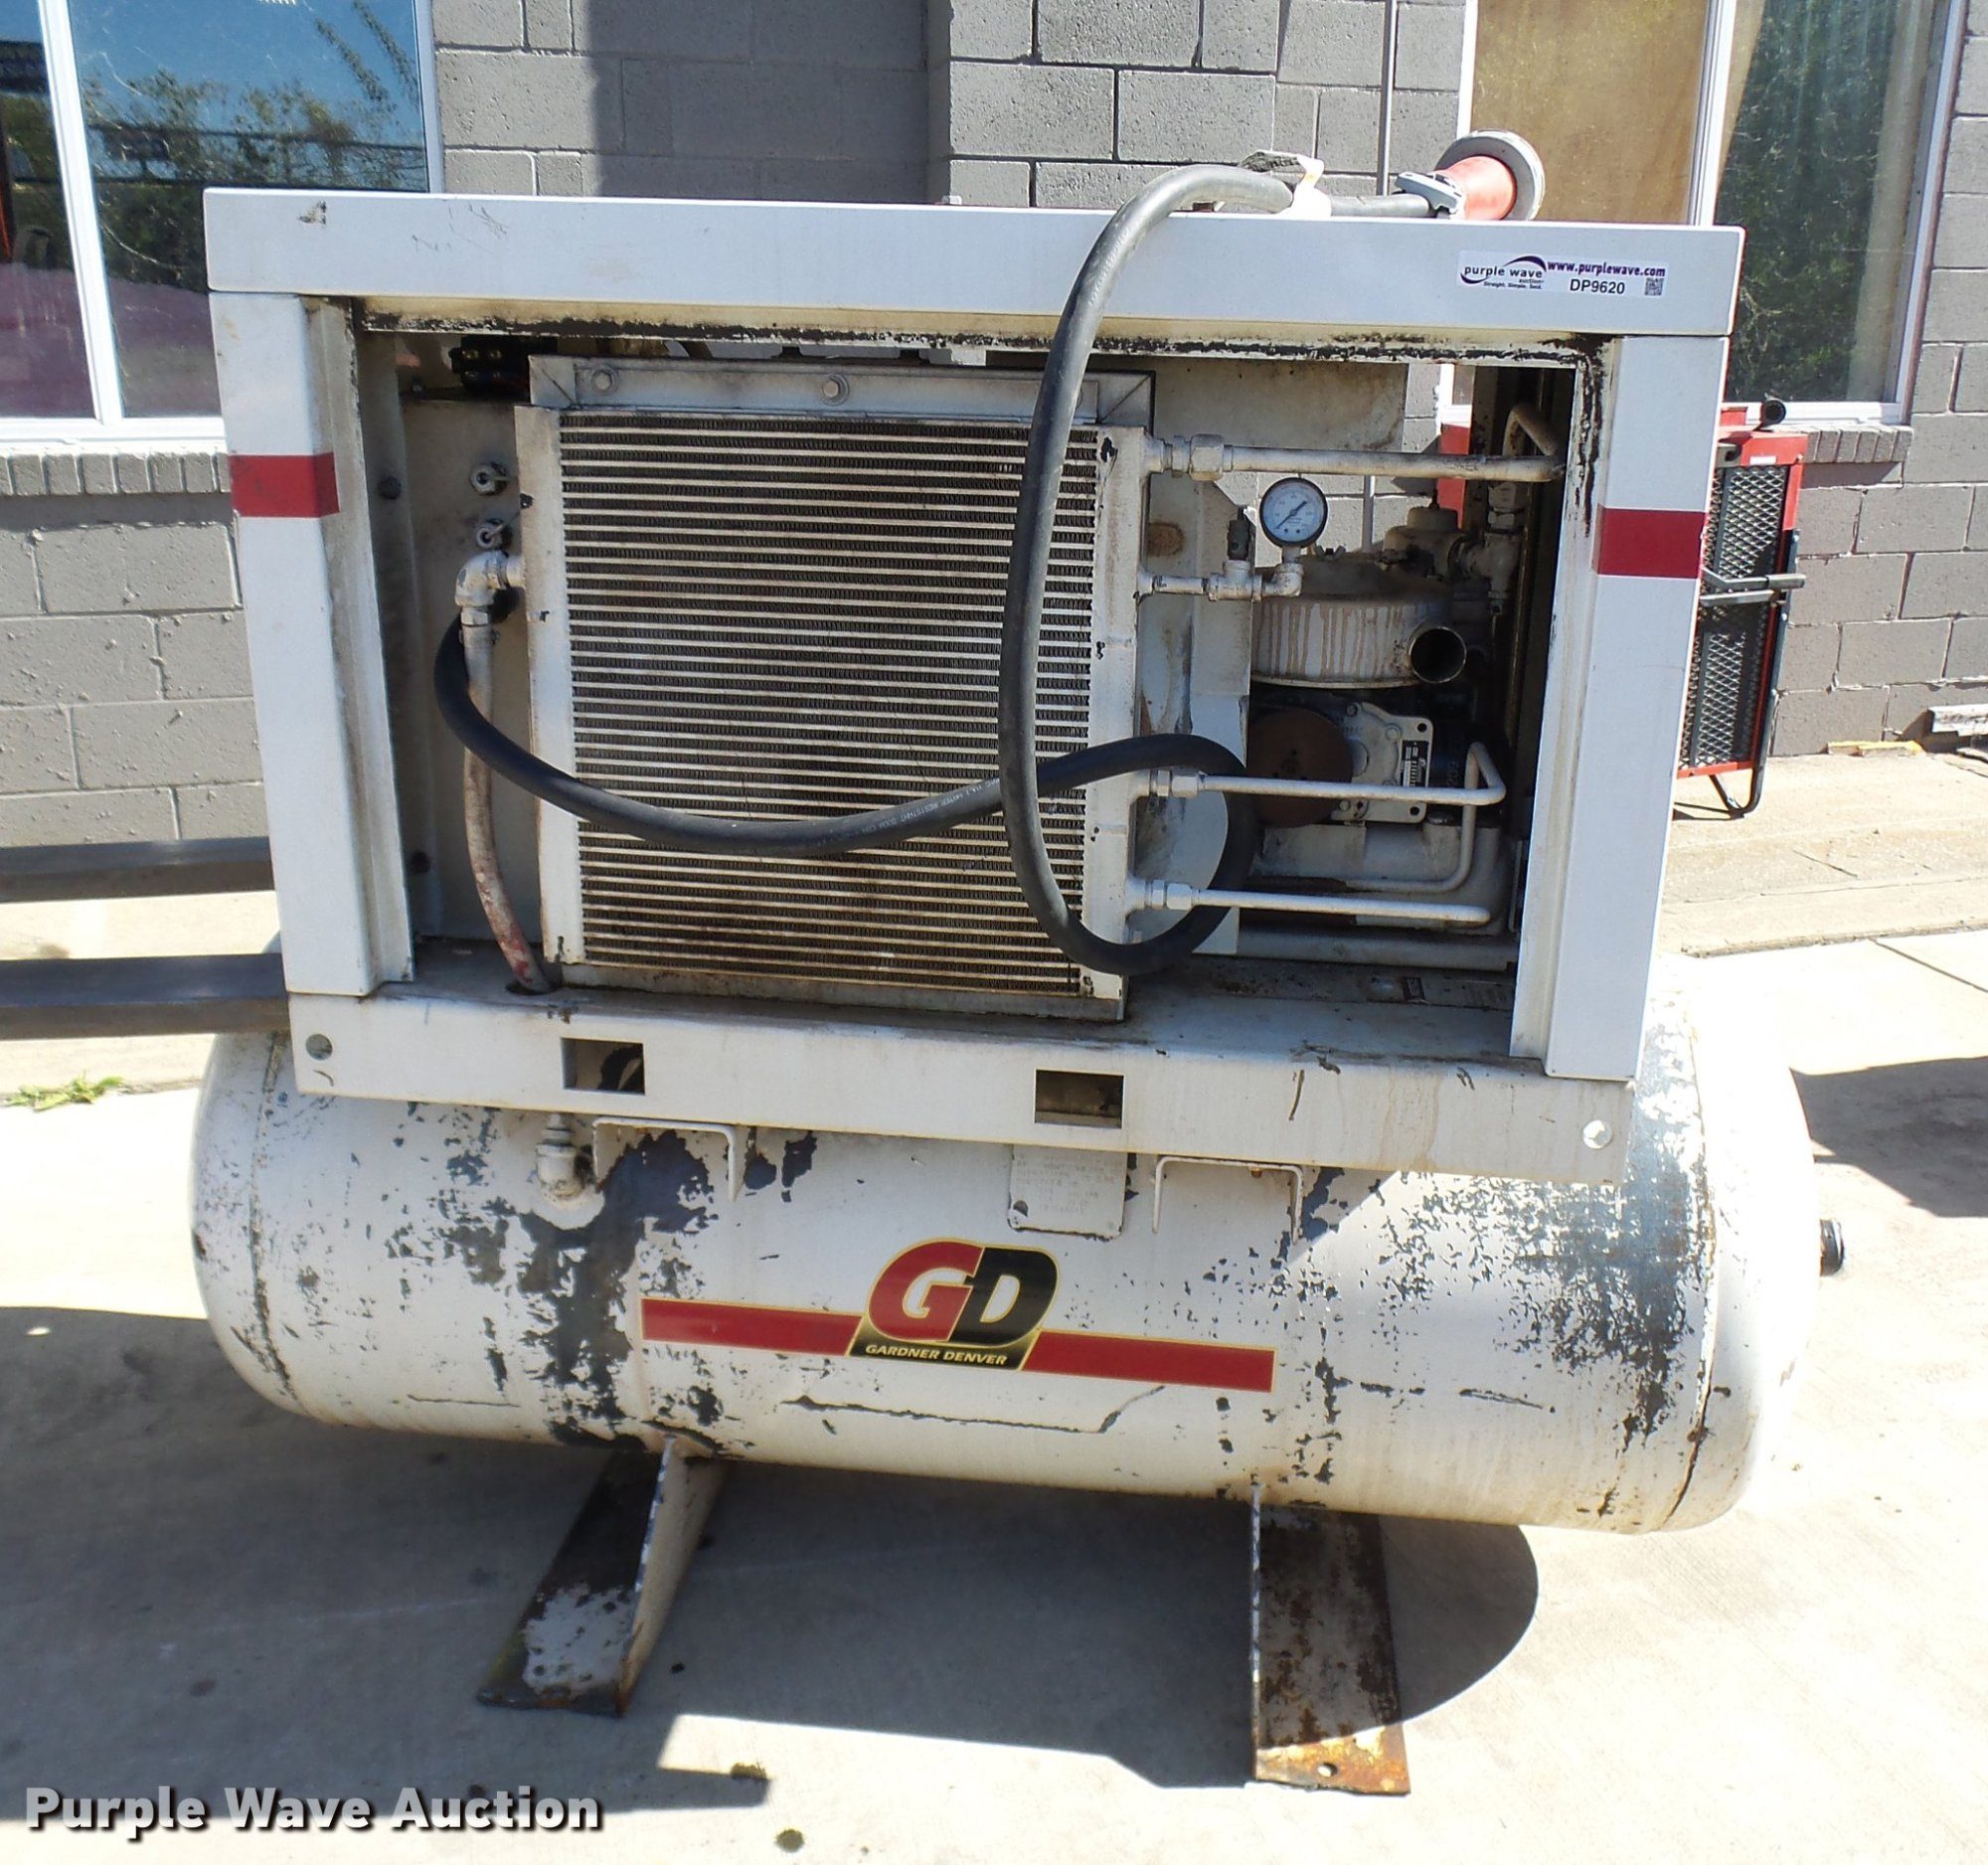 hight resolution of 1999 gardner denver eba99a air compressor for sale in missouri